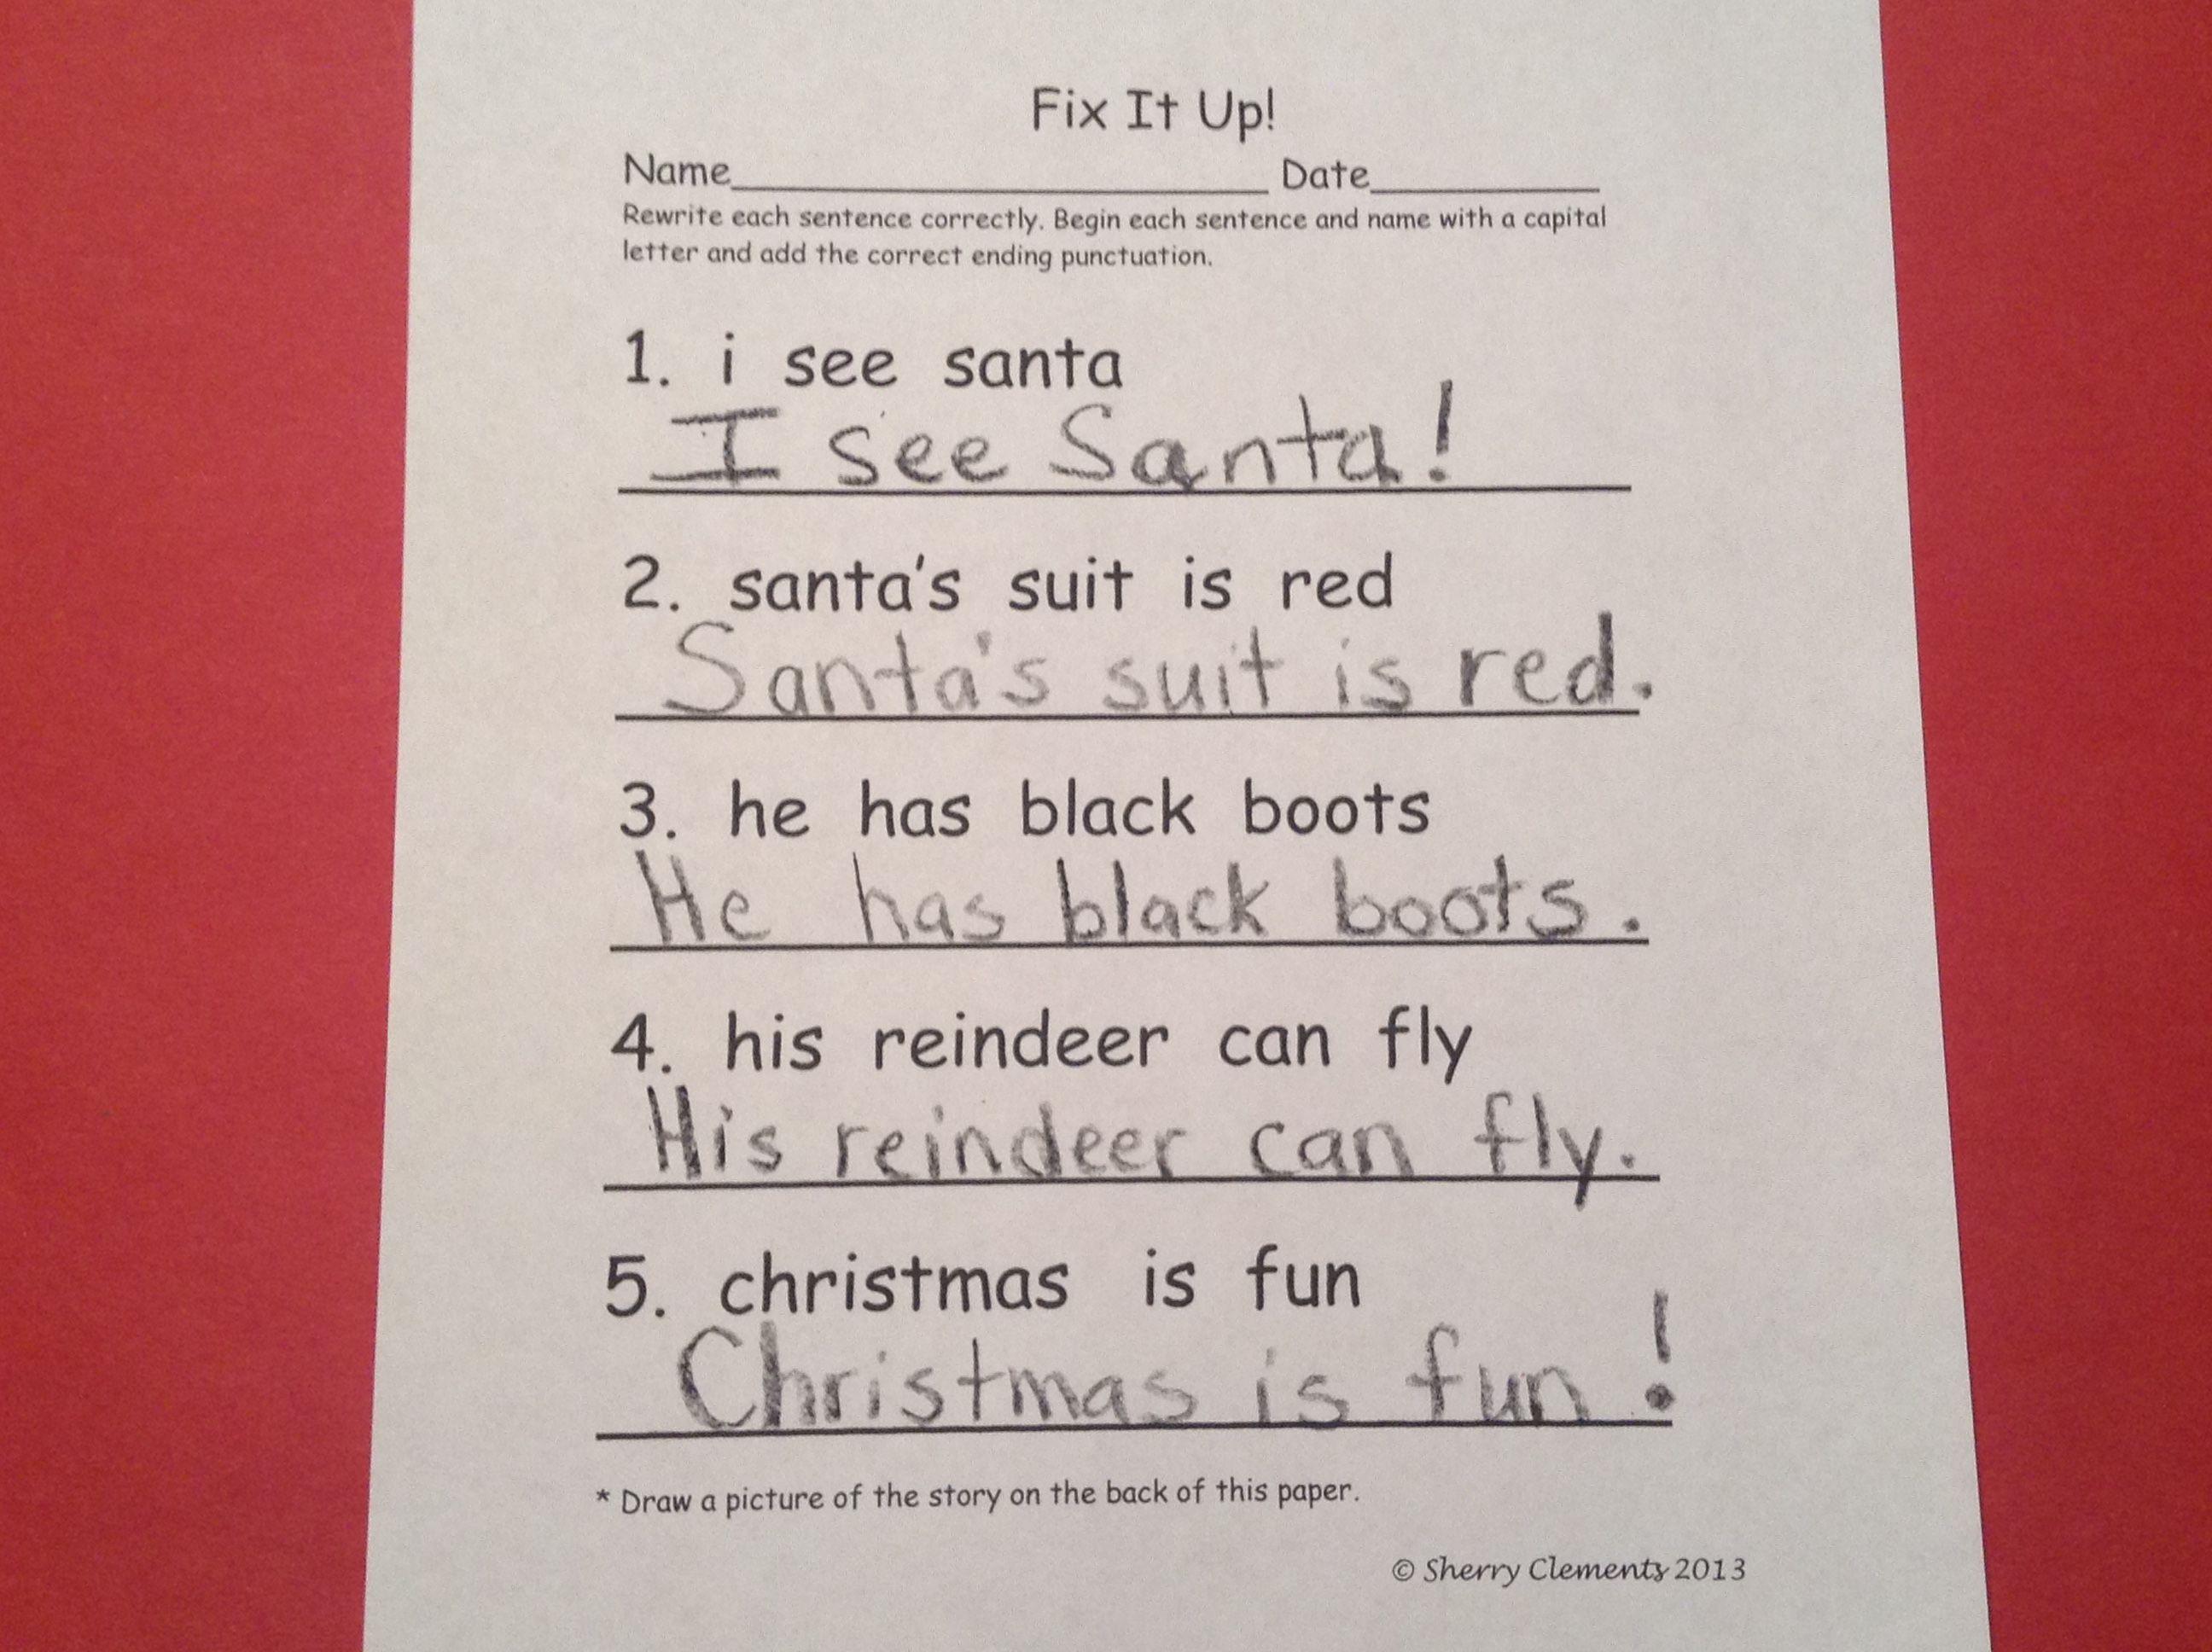 Christmas Fix It Up Sentences Freebie